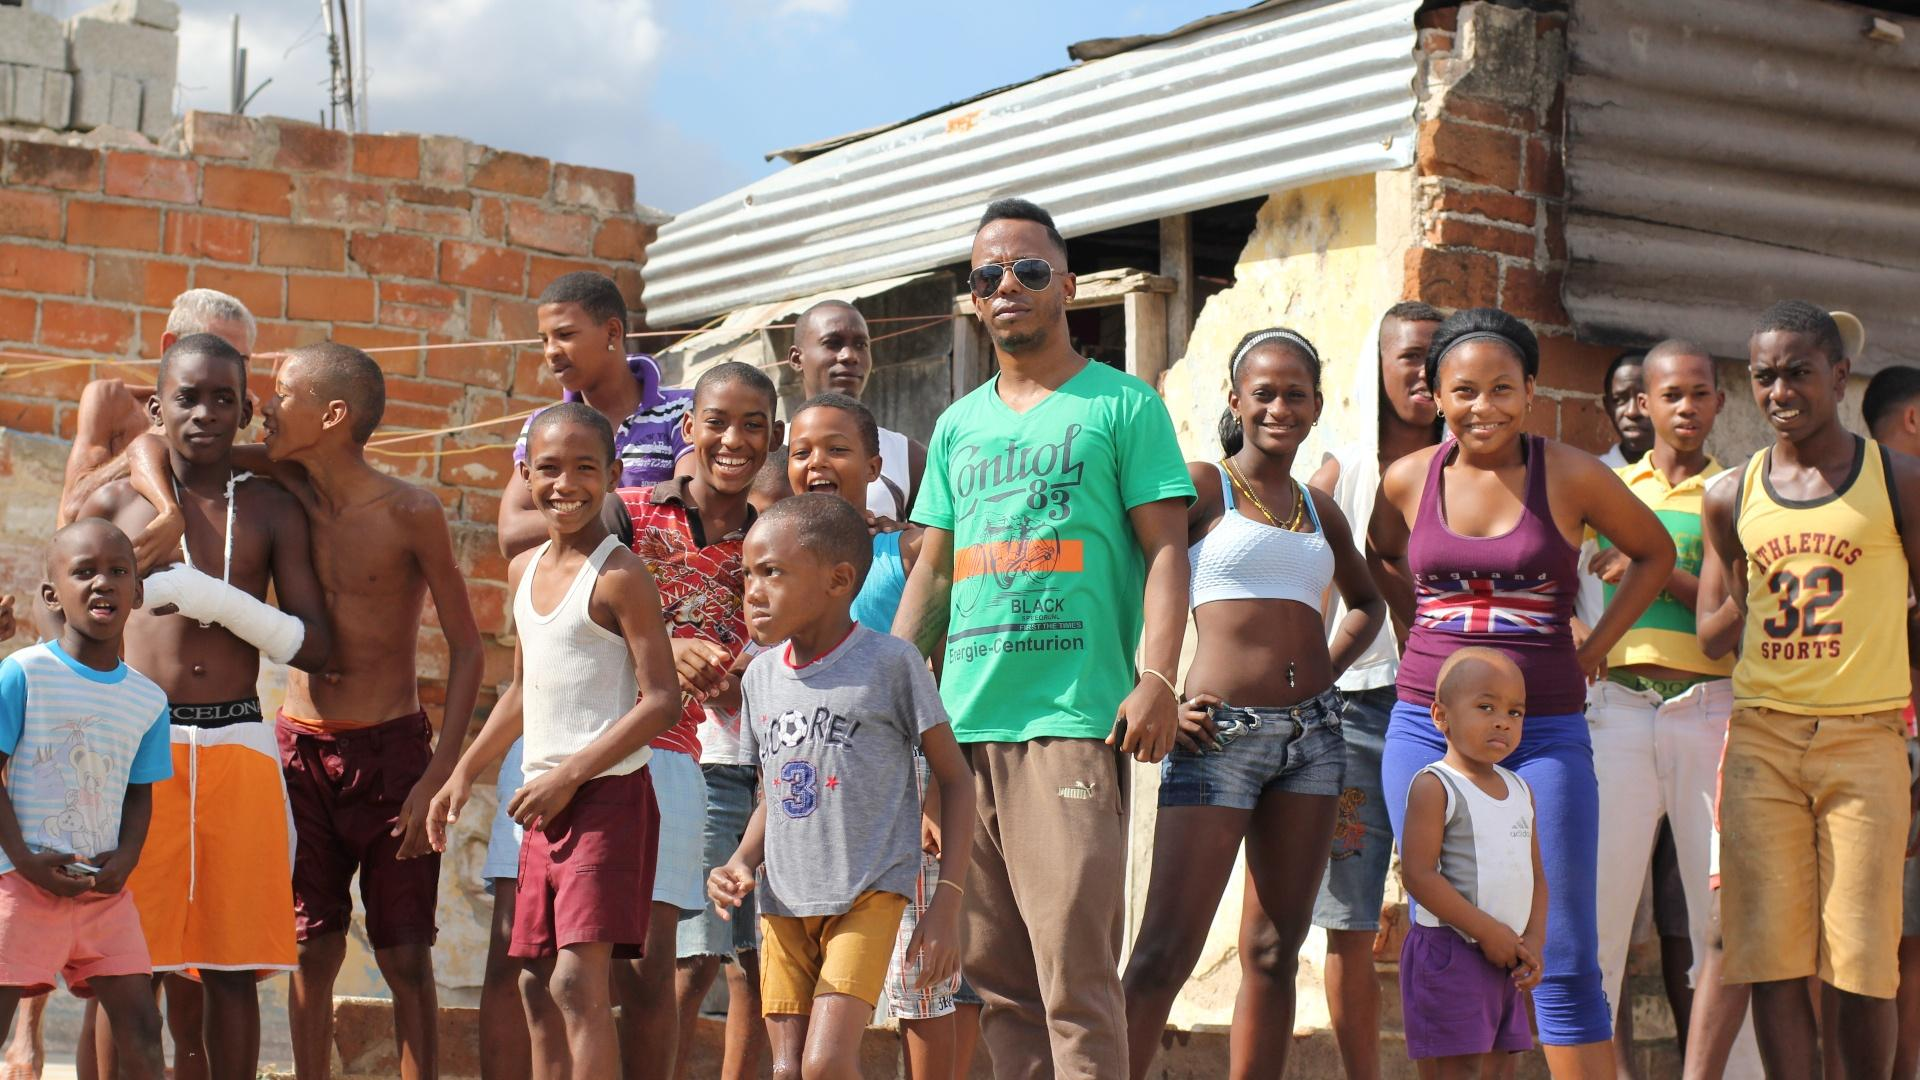 AfroPop: A Global Cultural Exchange